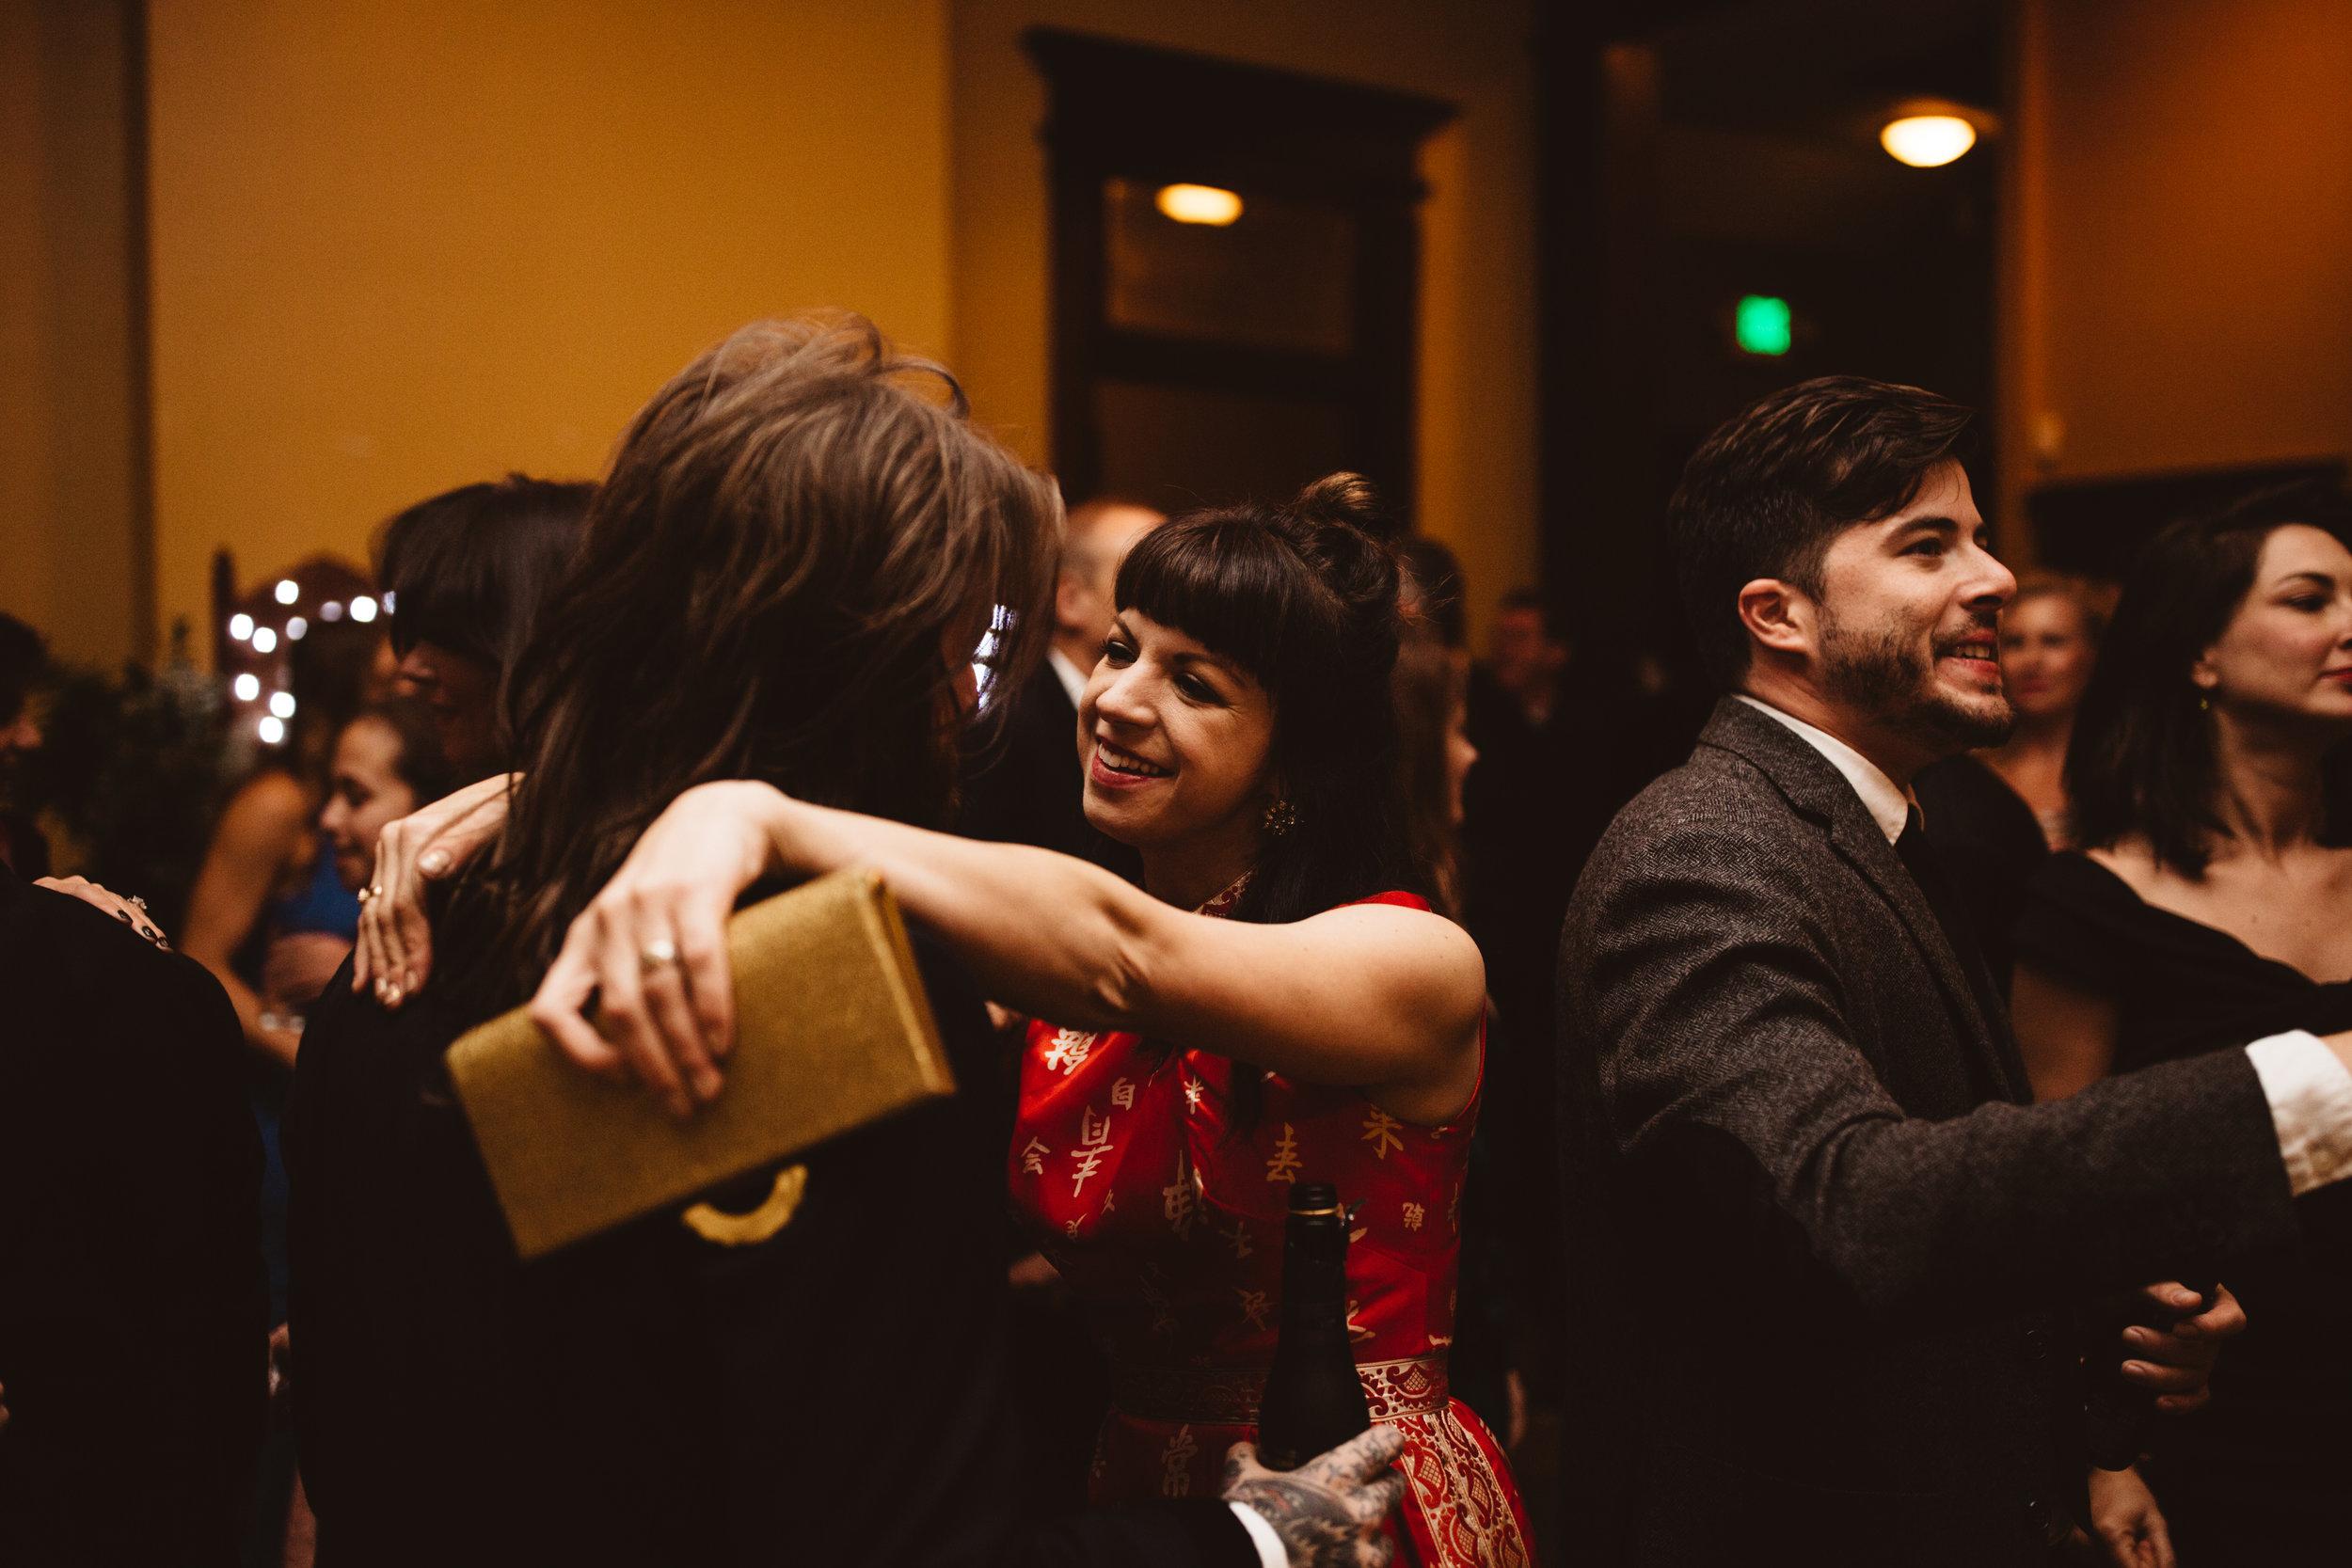 Mattie Bell Photography- Kelly & Zack Wedding Atlanta Brewery -434.jpg